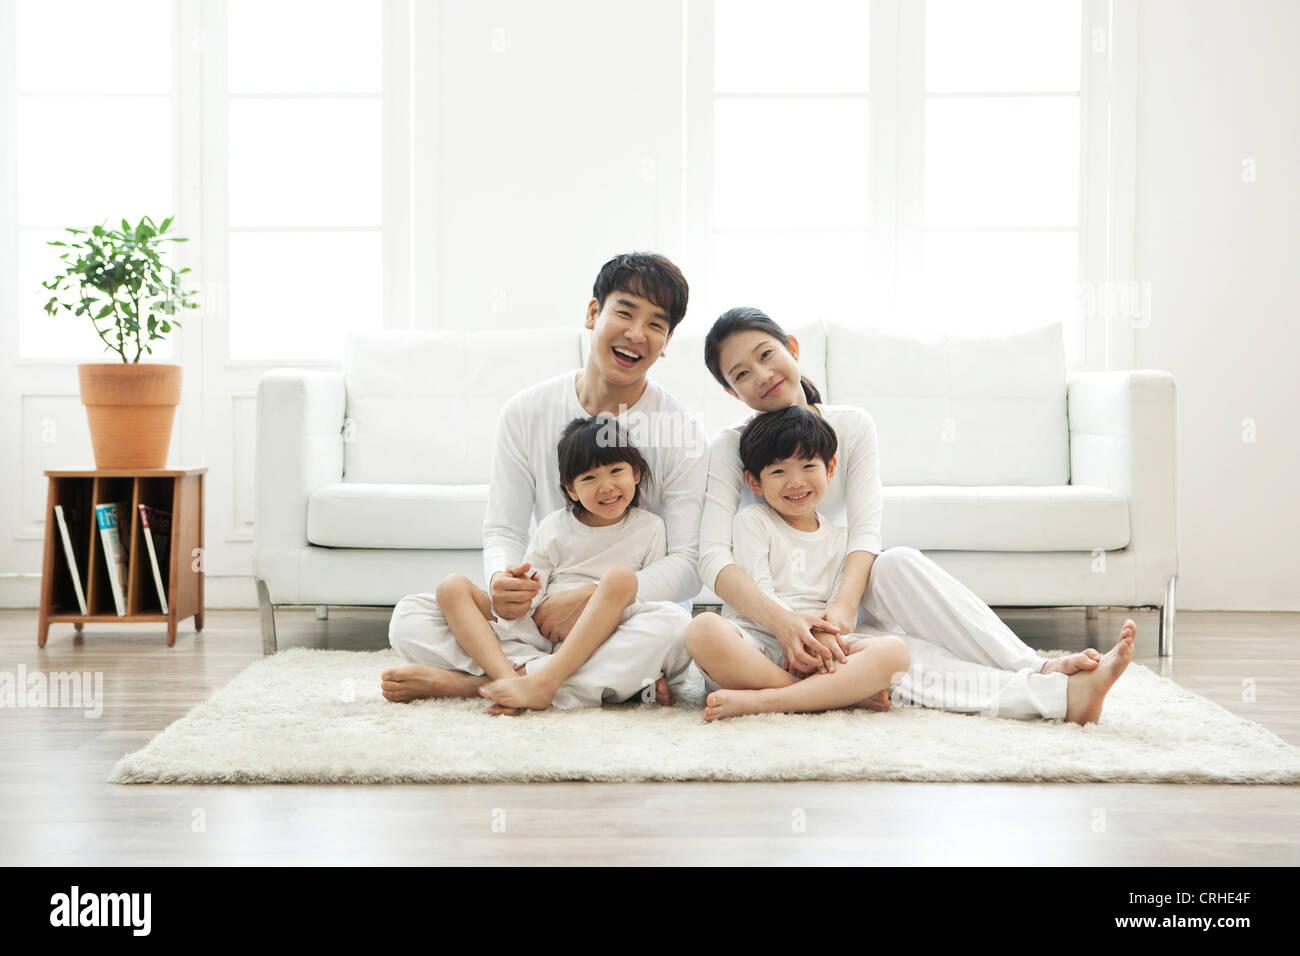 Harmonious Family In Living Room Stock Photos & Harmonious Family In ...